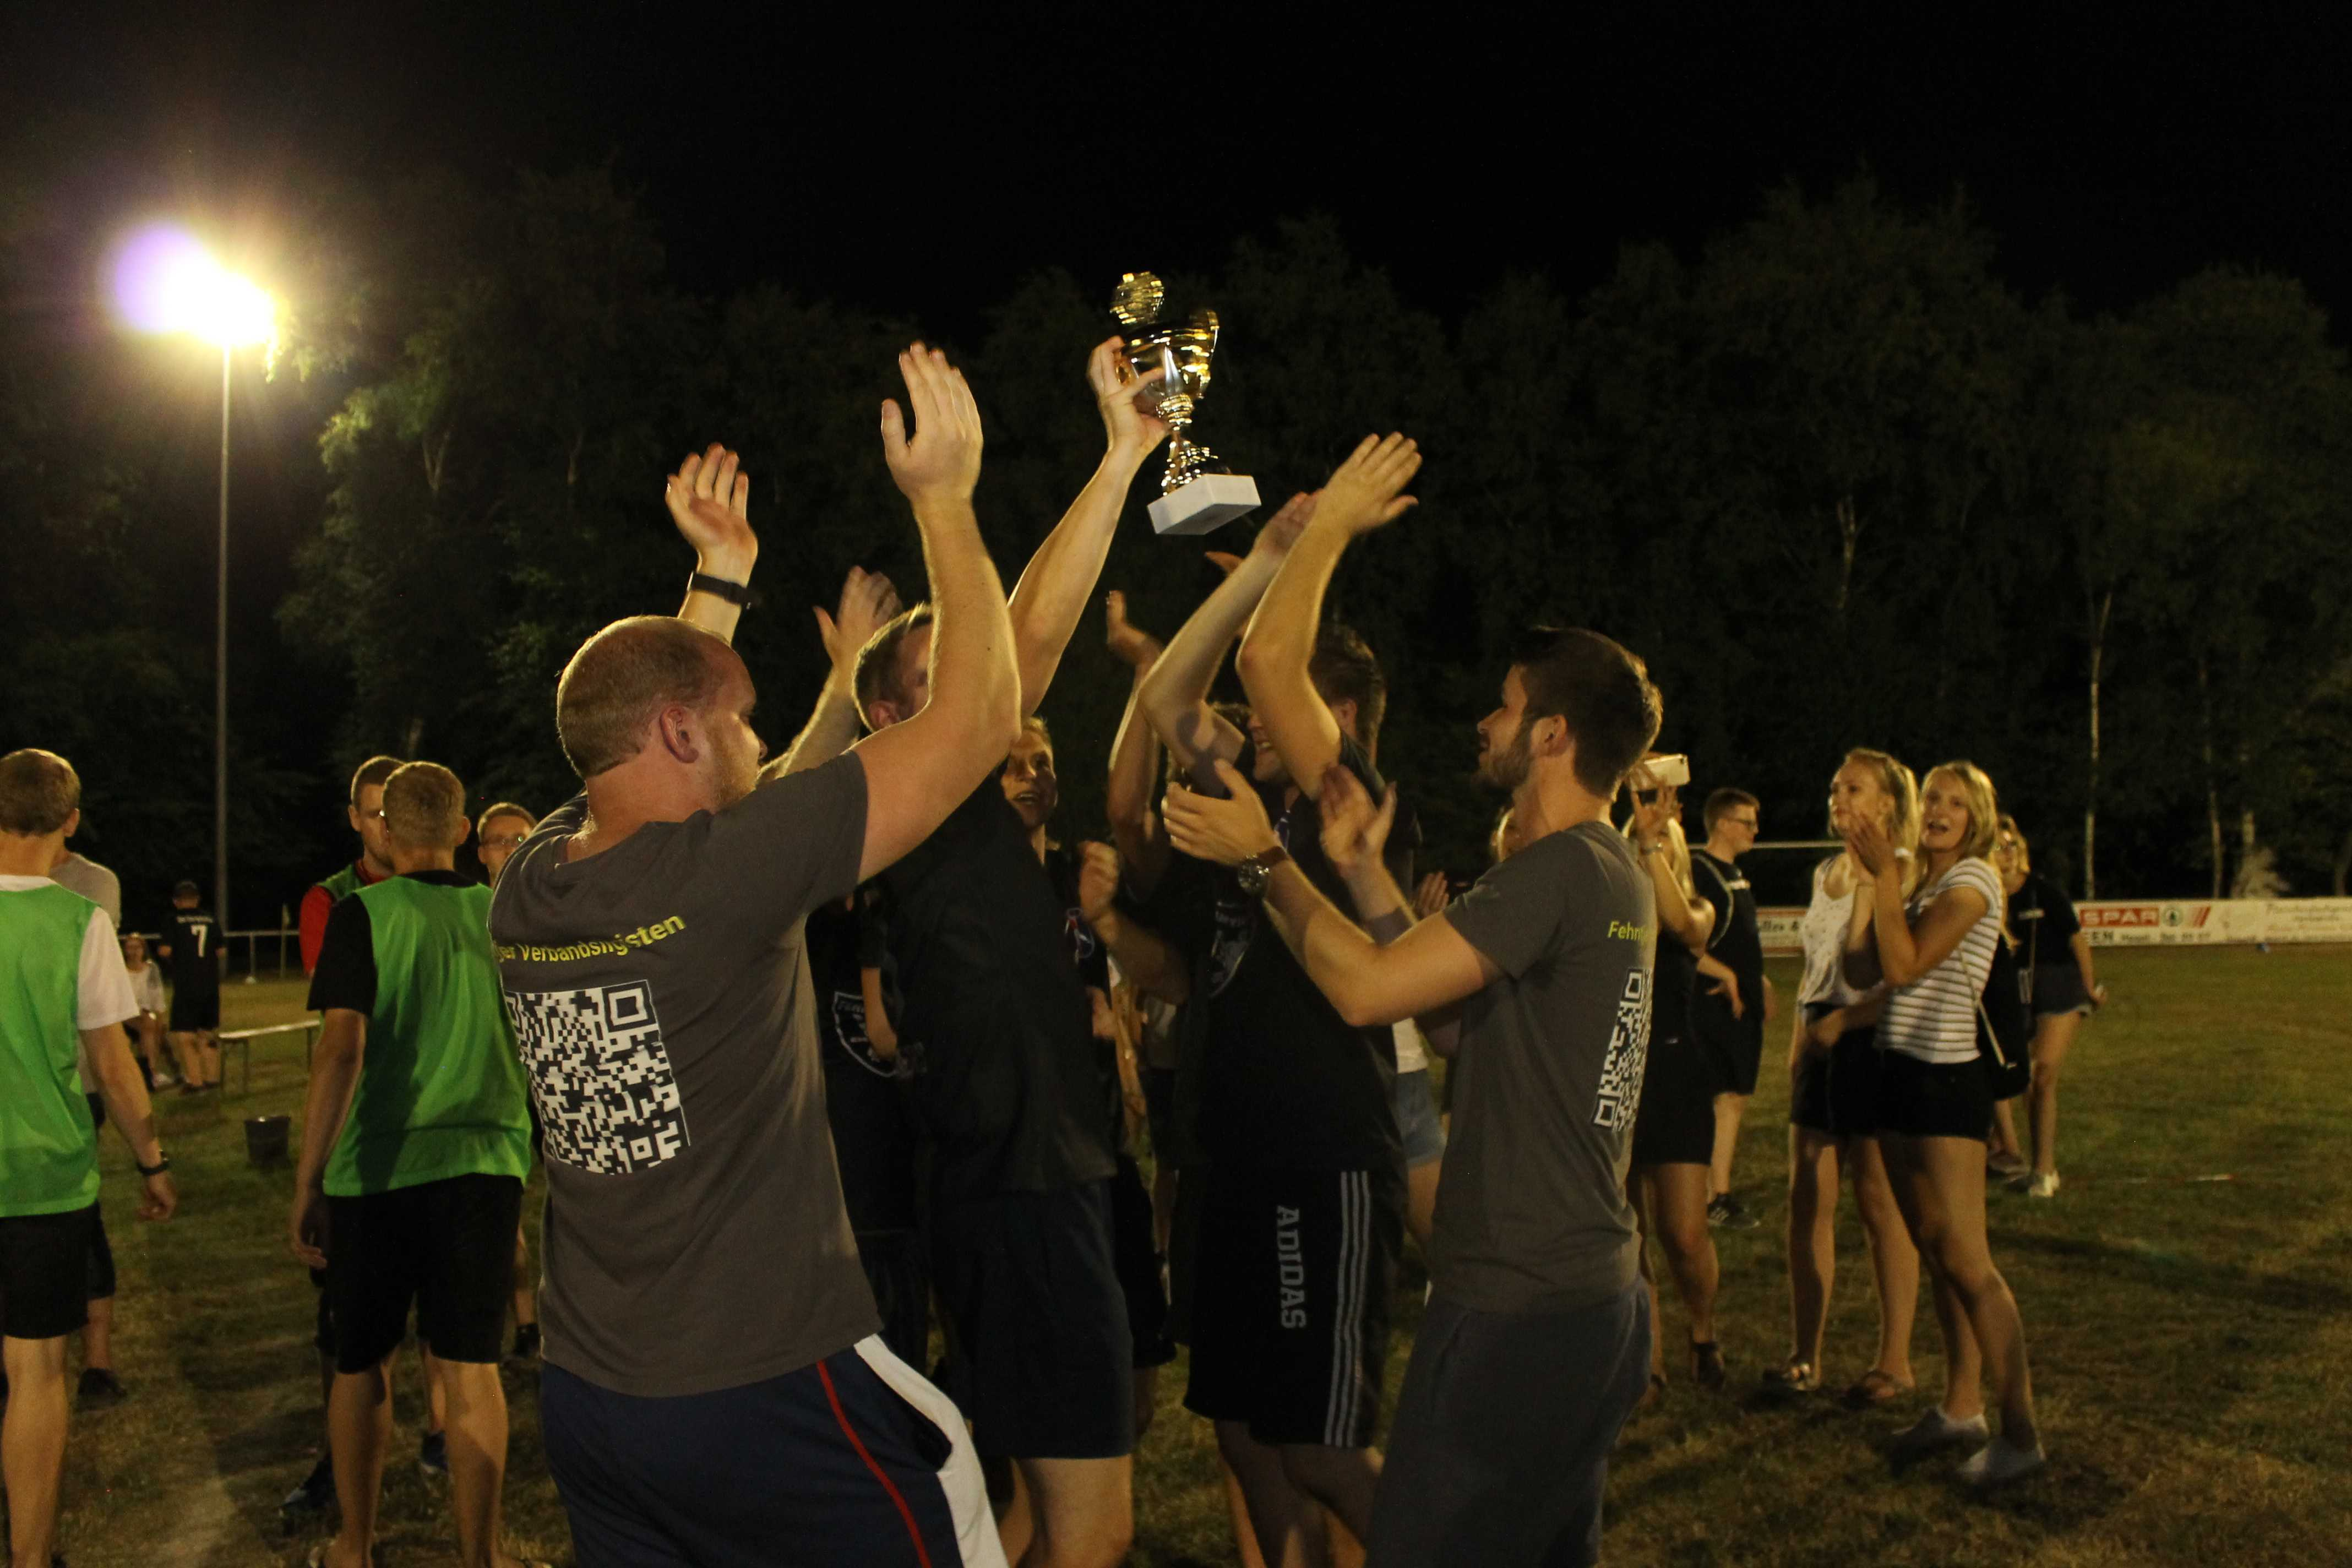 2018-07-27 Sportwoche - Flunkyball Turnier (97)